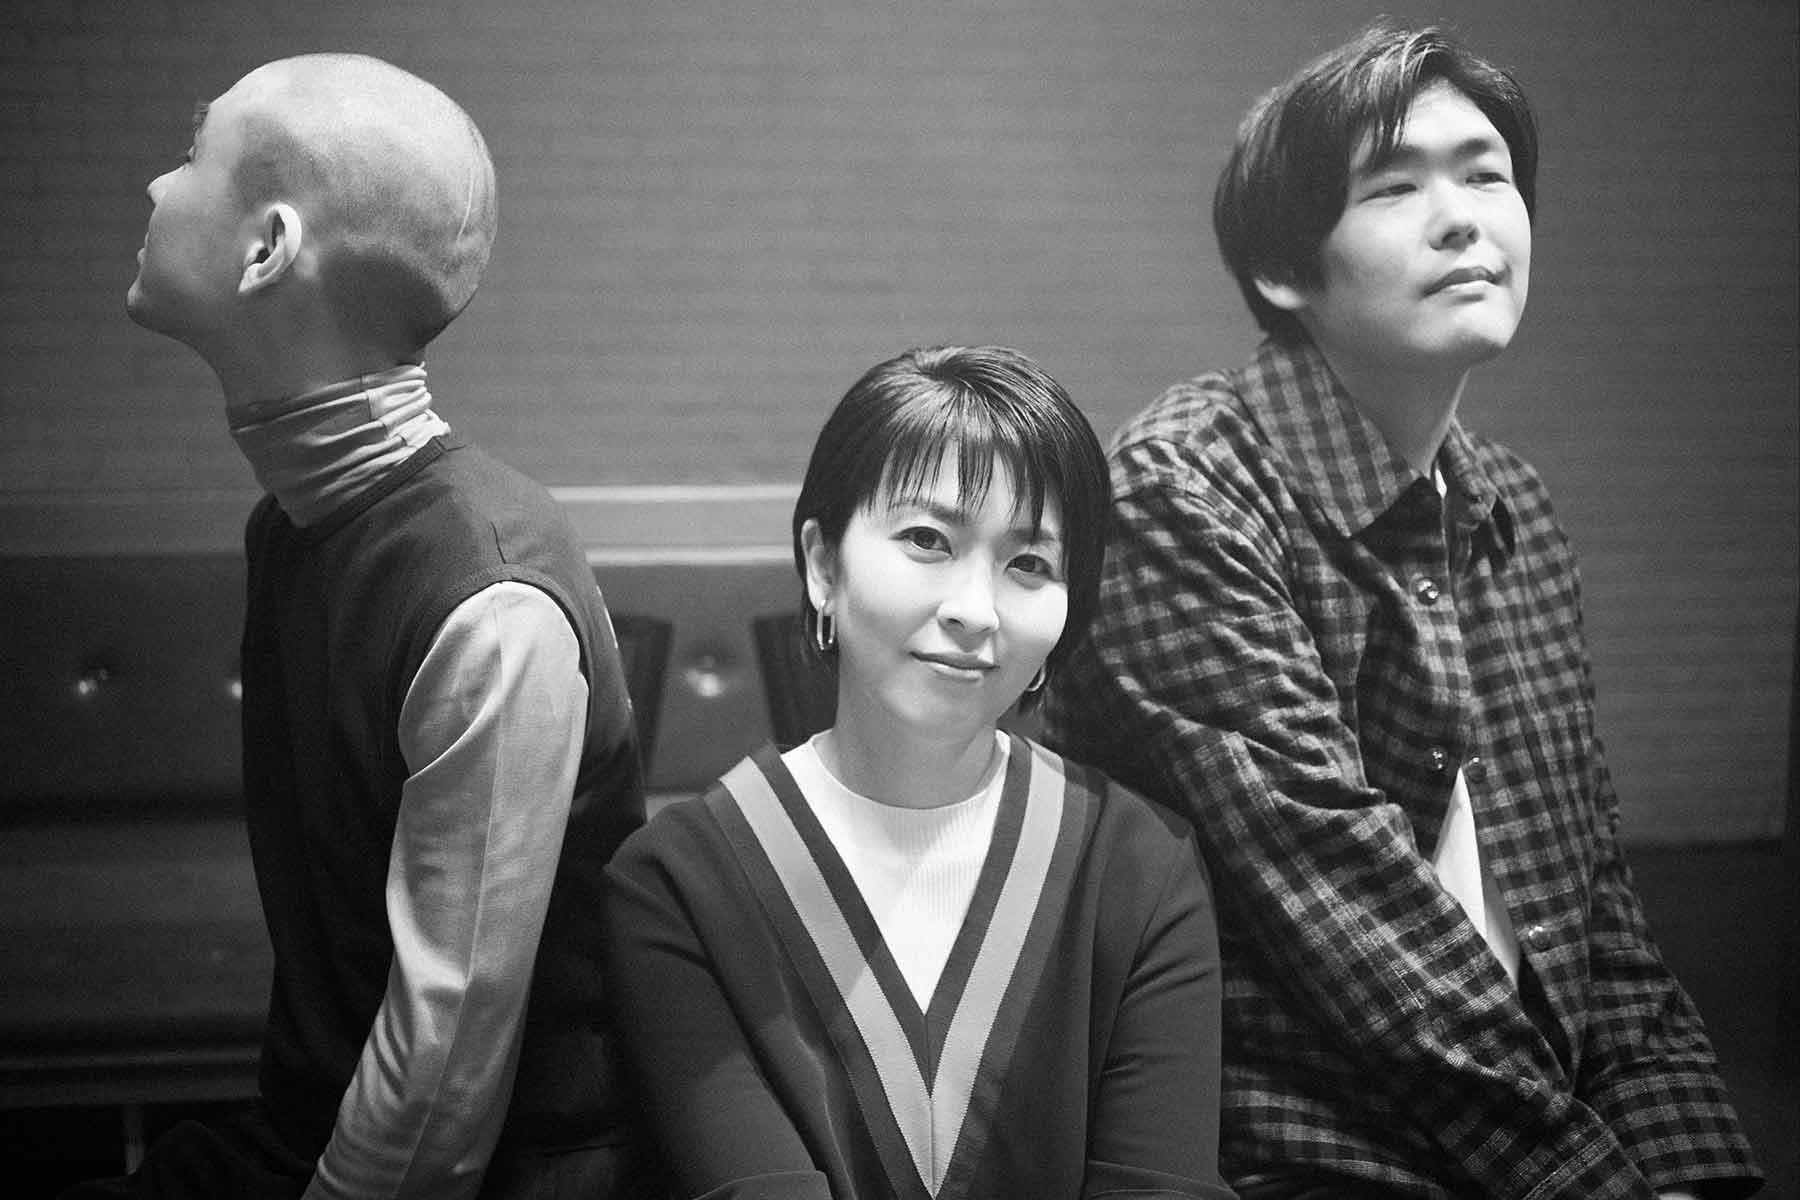 STUTS & 松たか子 with 3exes feat. KID FRESINOの画像